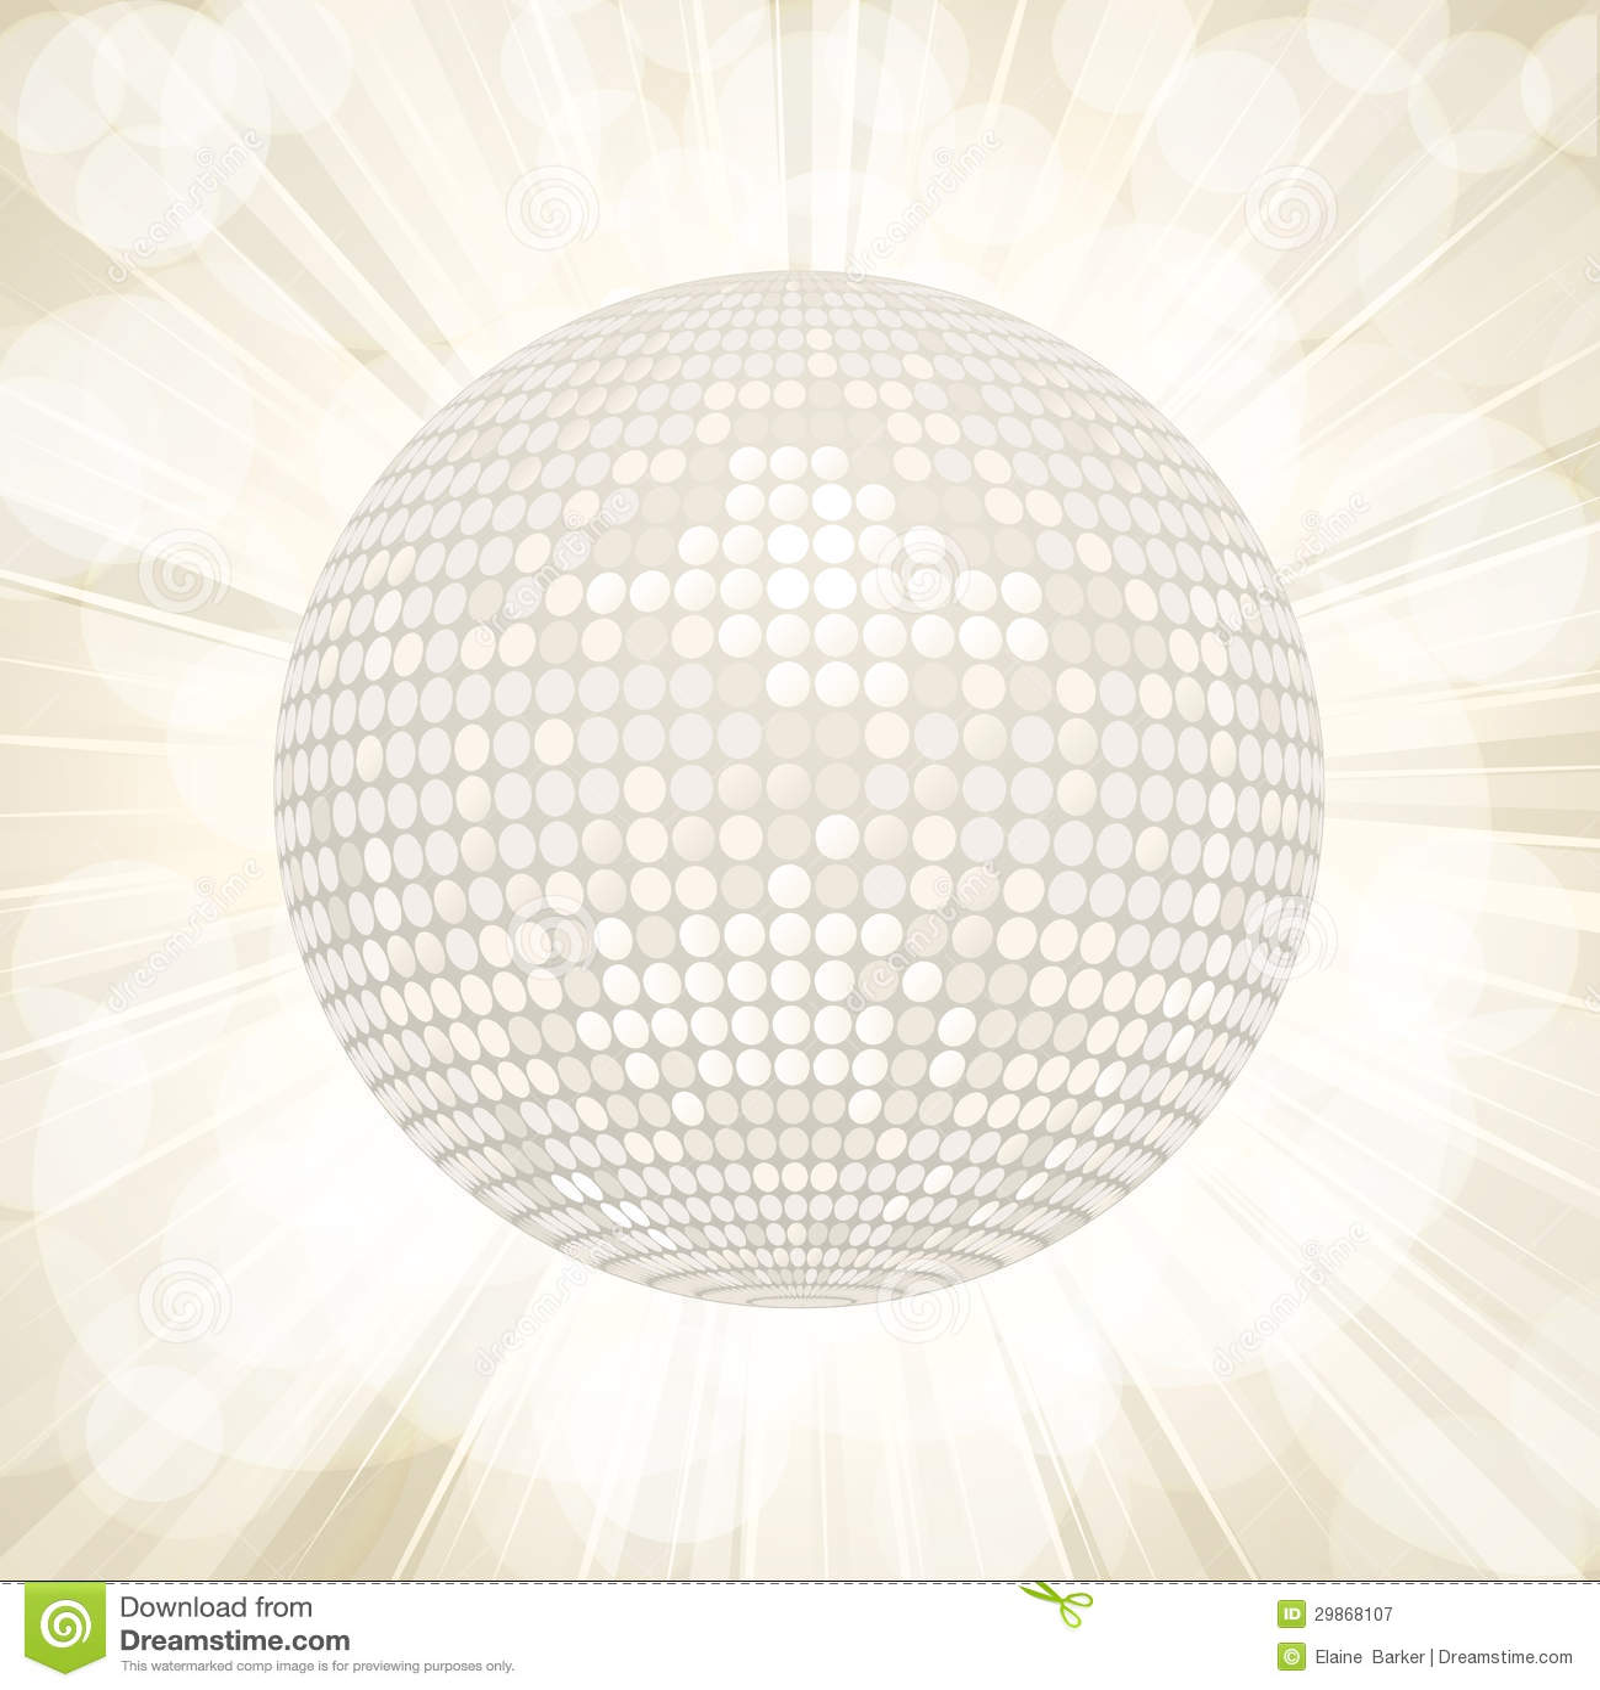 disco ball background white -#main